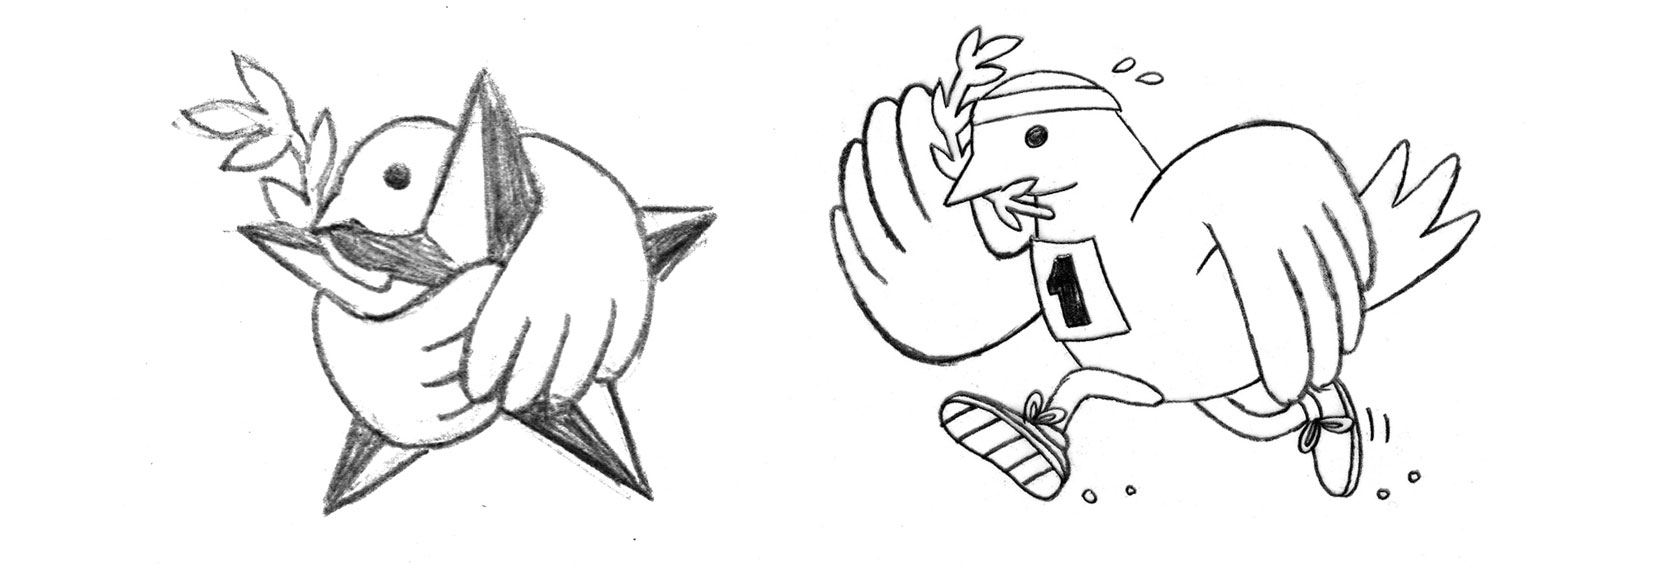 flc sketches